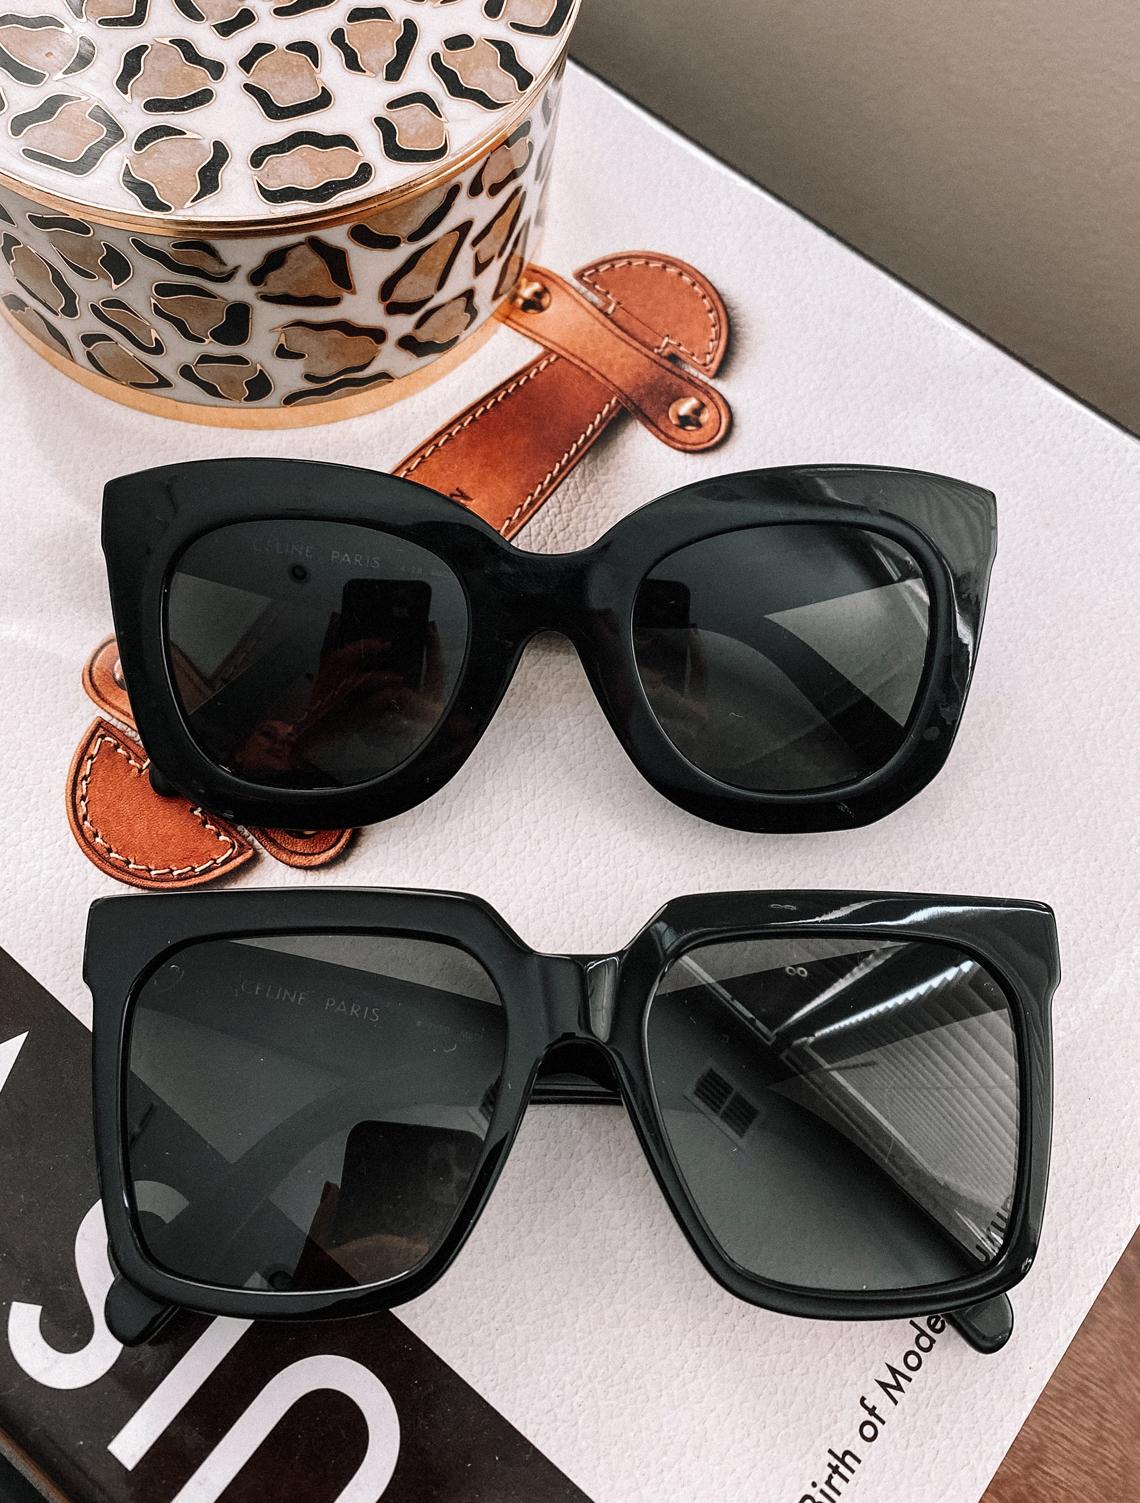 Fashion Jackson Black Celine Sunglasses